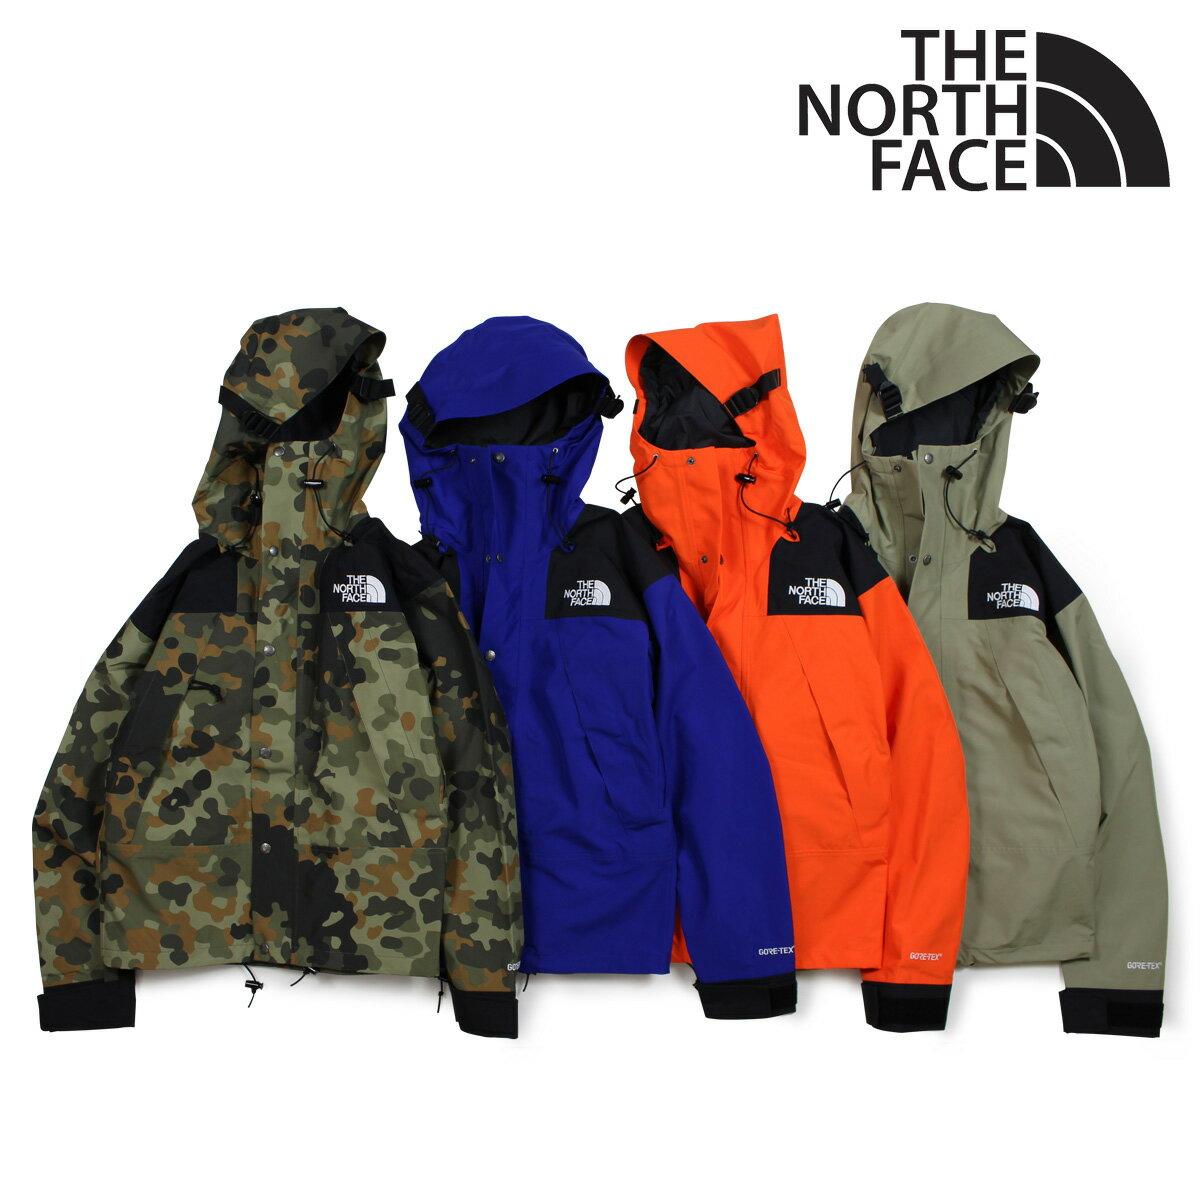 THE NORTH FACE ノースフェイス ジャケット ゴアテックス マウンテンジャケット メンズ MENS 1990 MOUNTAIN JACKET GTX NF0A3JPA